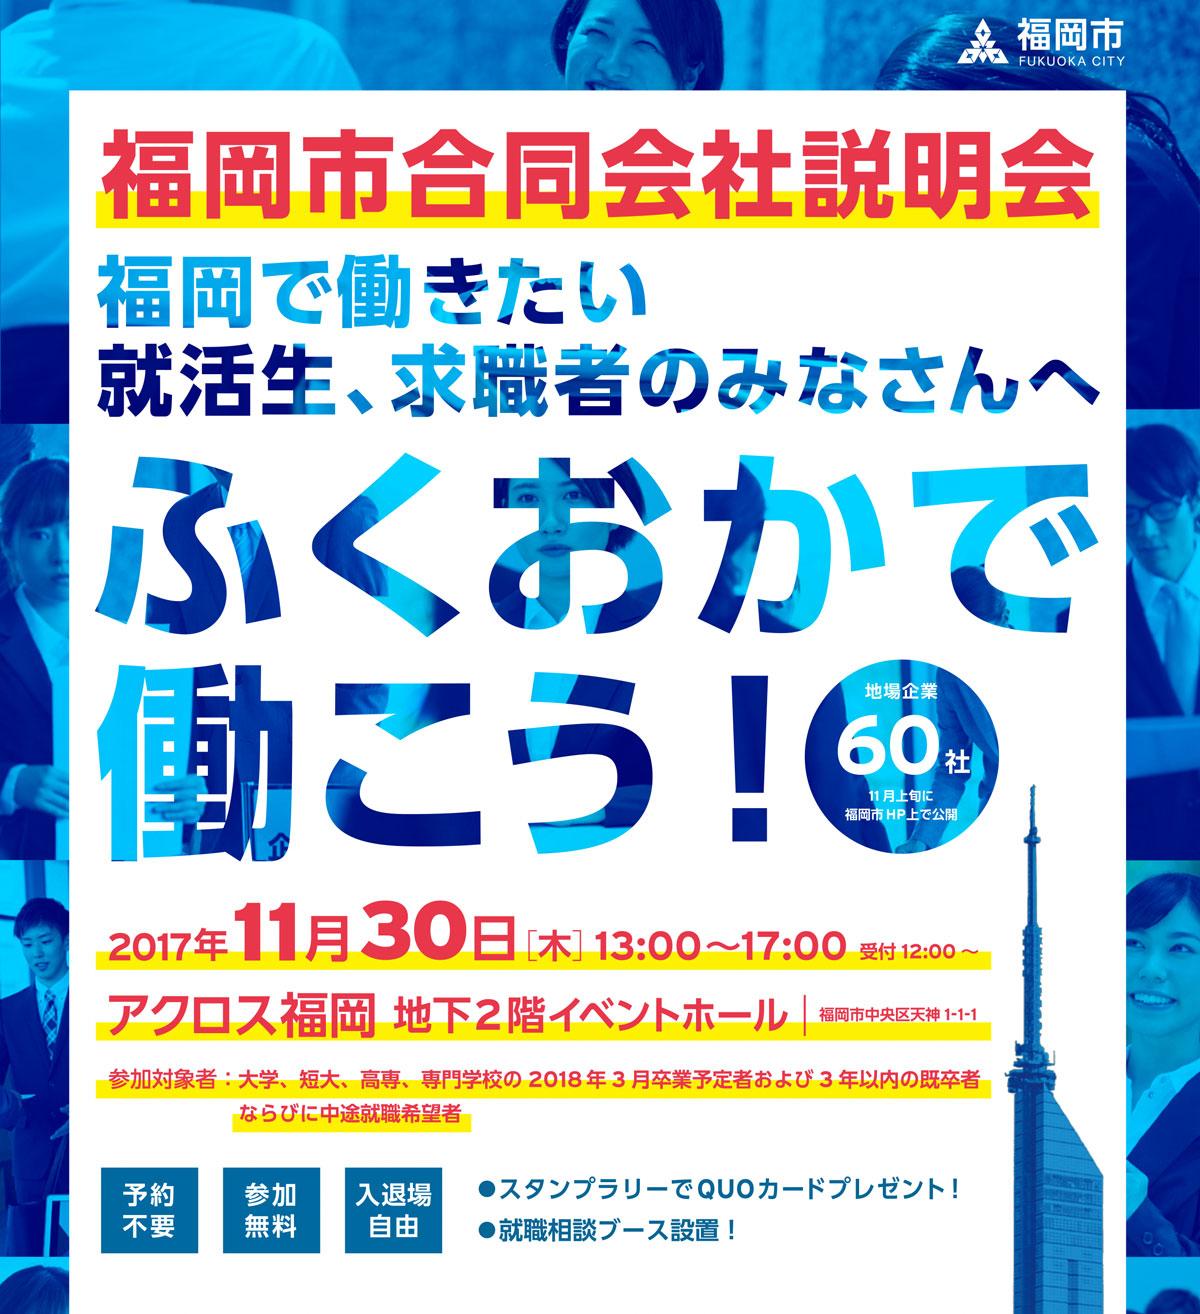 福岡企業合同説明会・GWX採用イベント